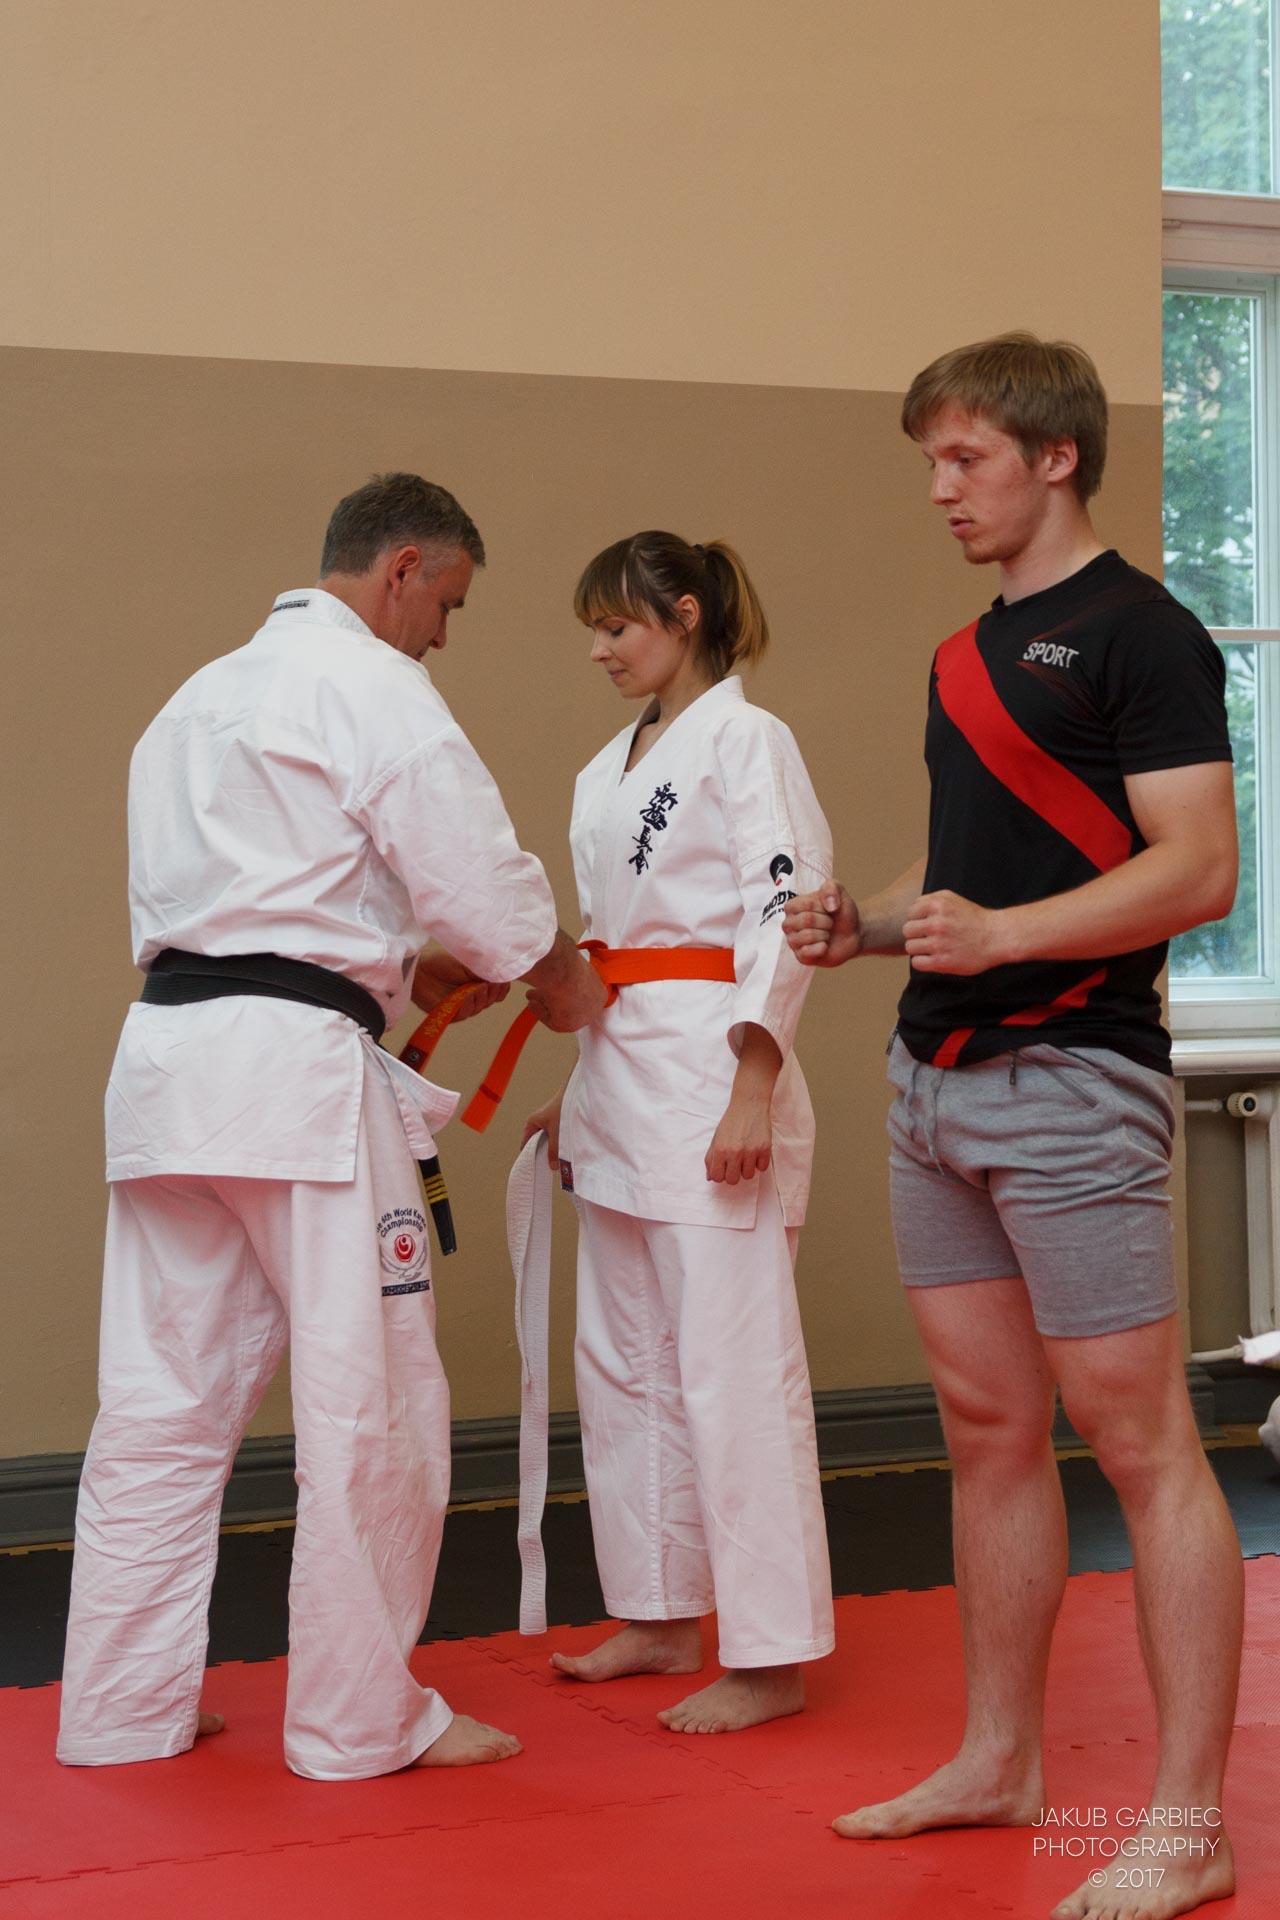 egzamin-karate-mistrz-mariusz-mazur-klub-karate-shodan-2017-06-02-20